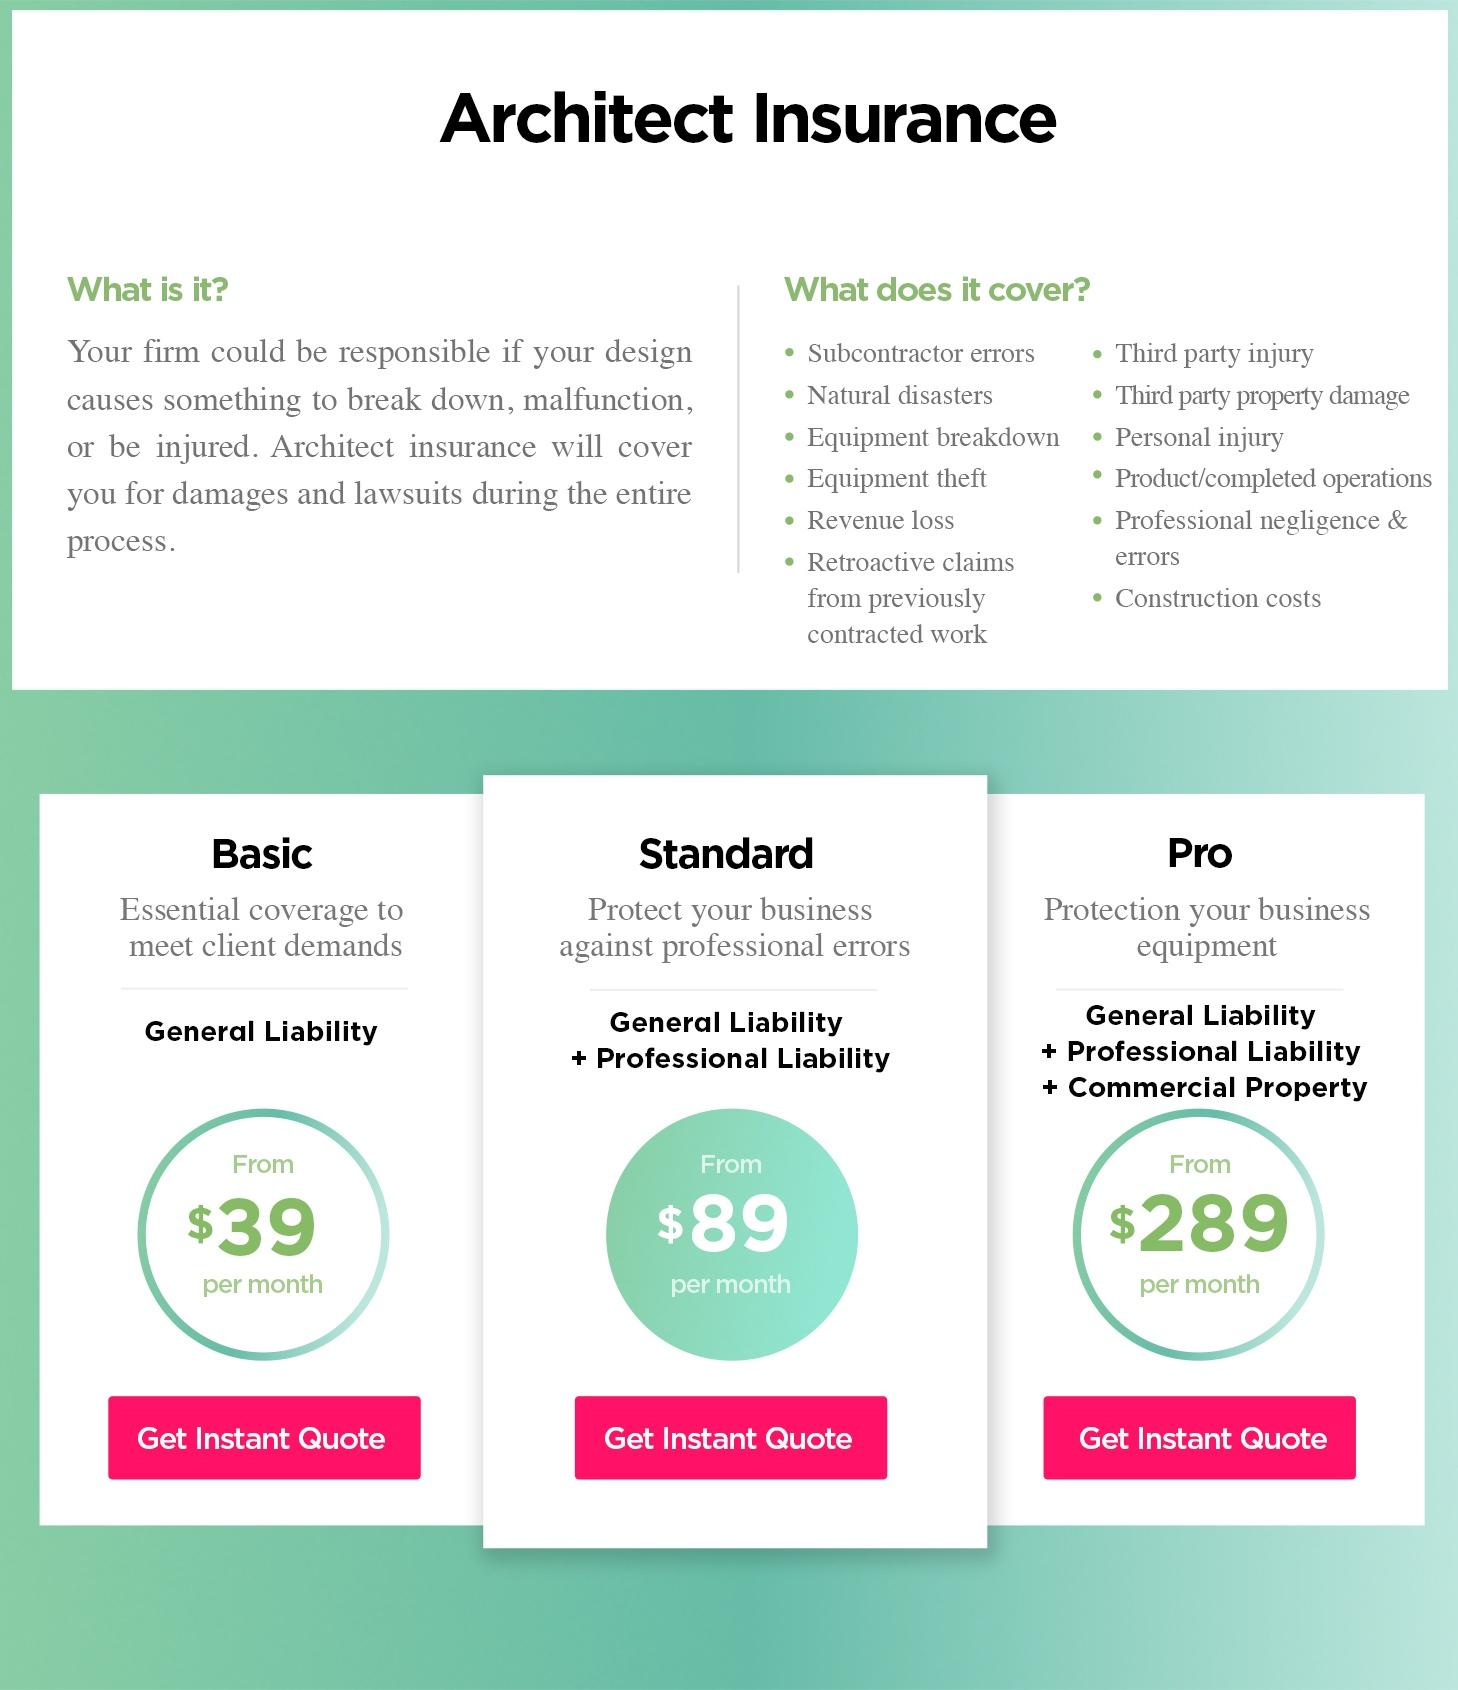 Architect Insurance Cost